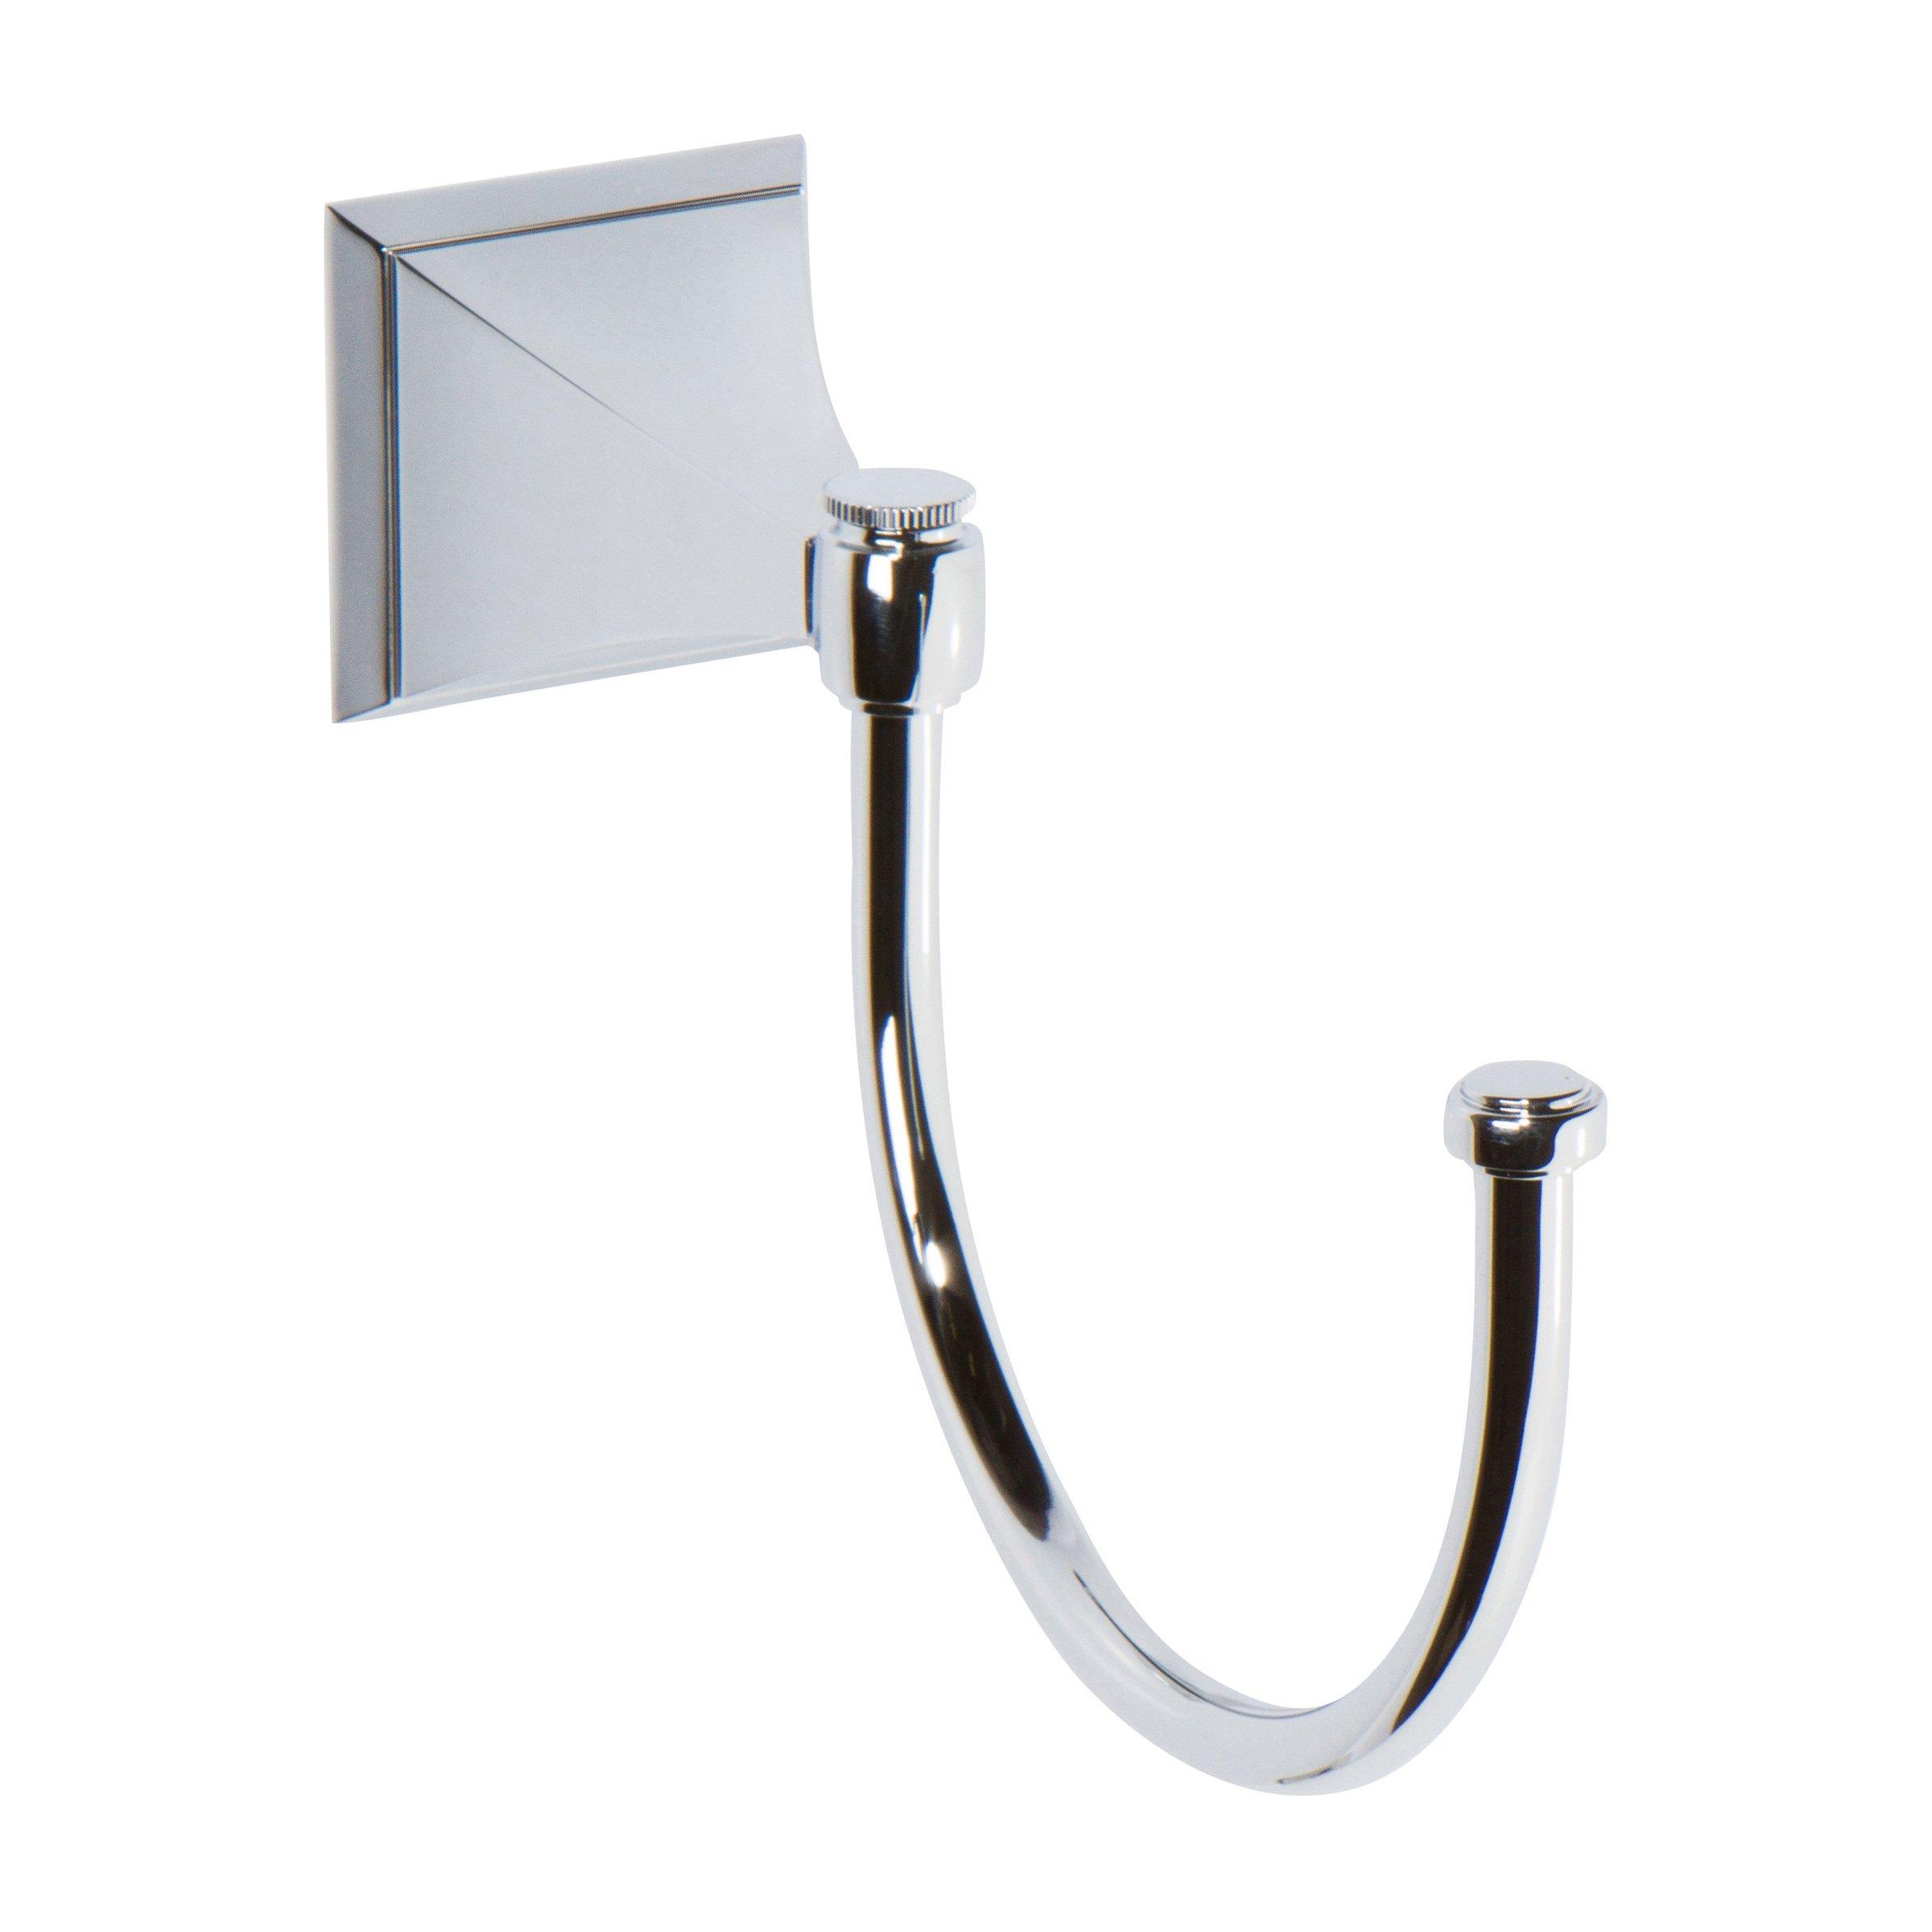 Ginger Cayden Pivoting Towel Hook - 4921/PC - Polished Chrome